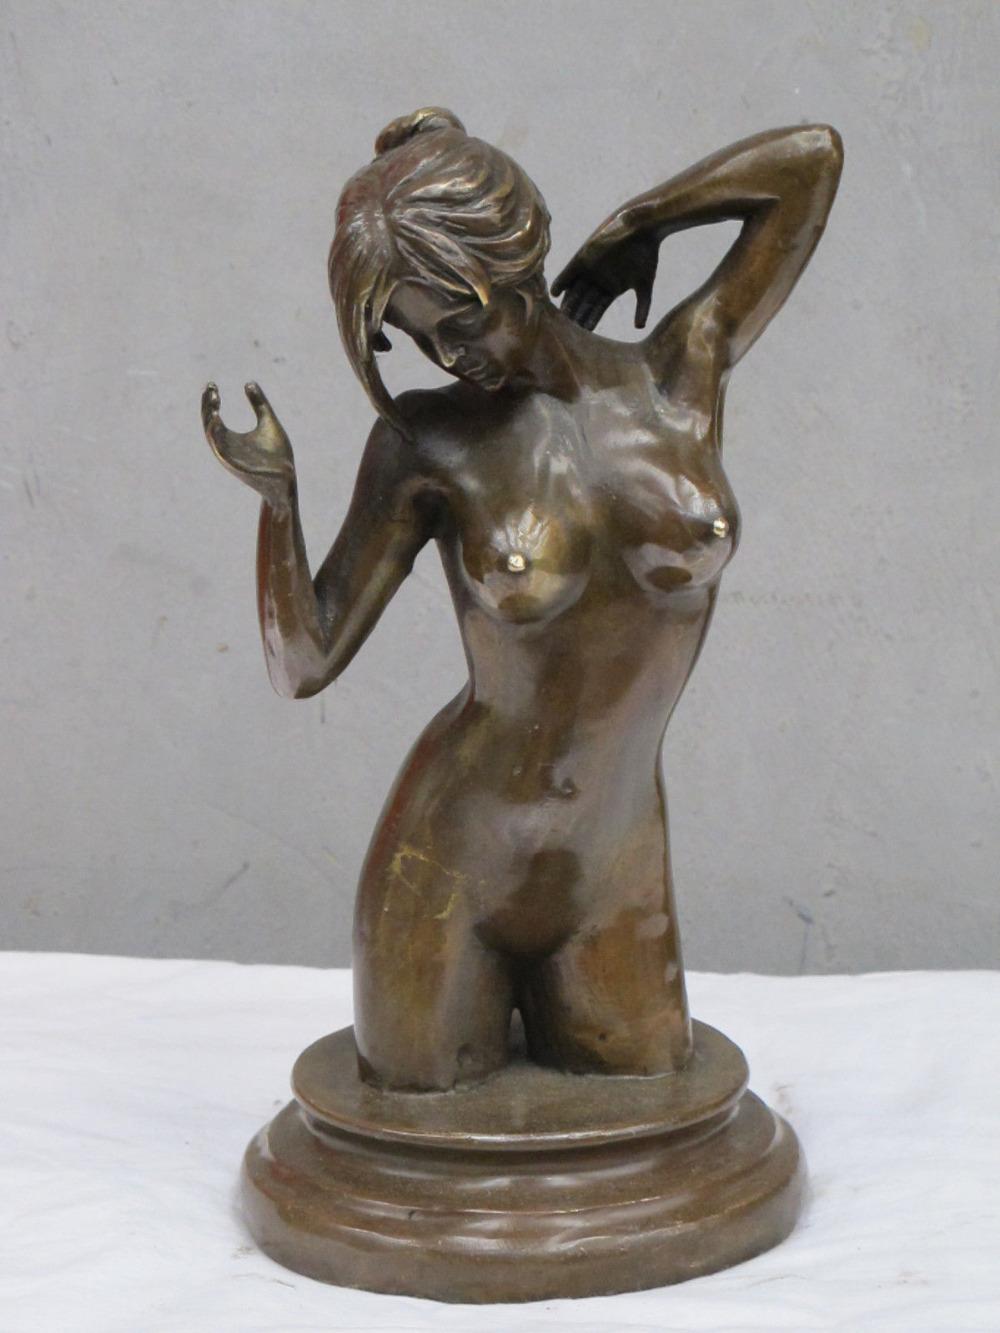 Скульптура голой девушки фото 19 фотография